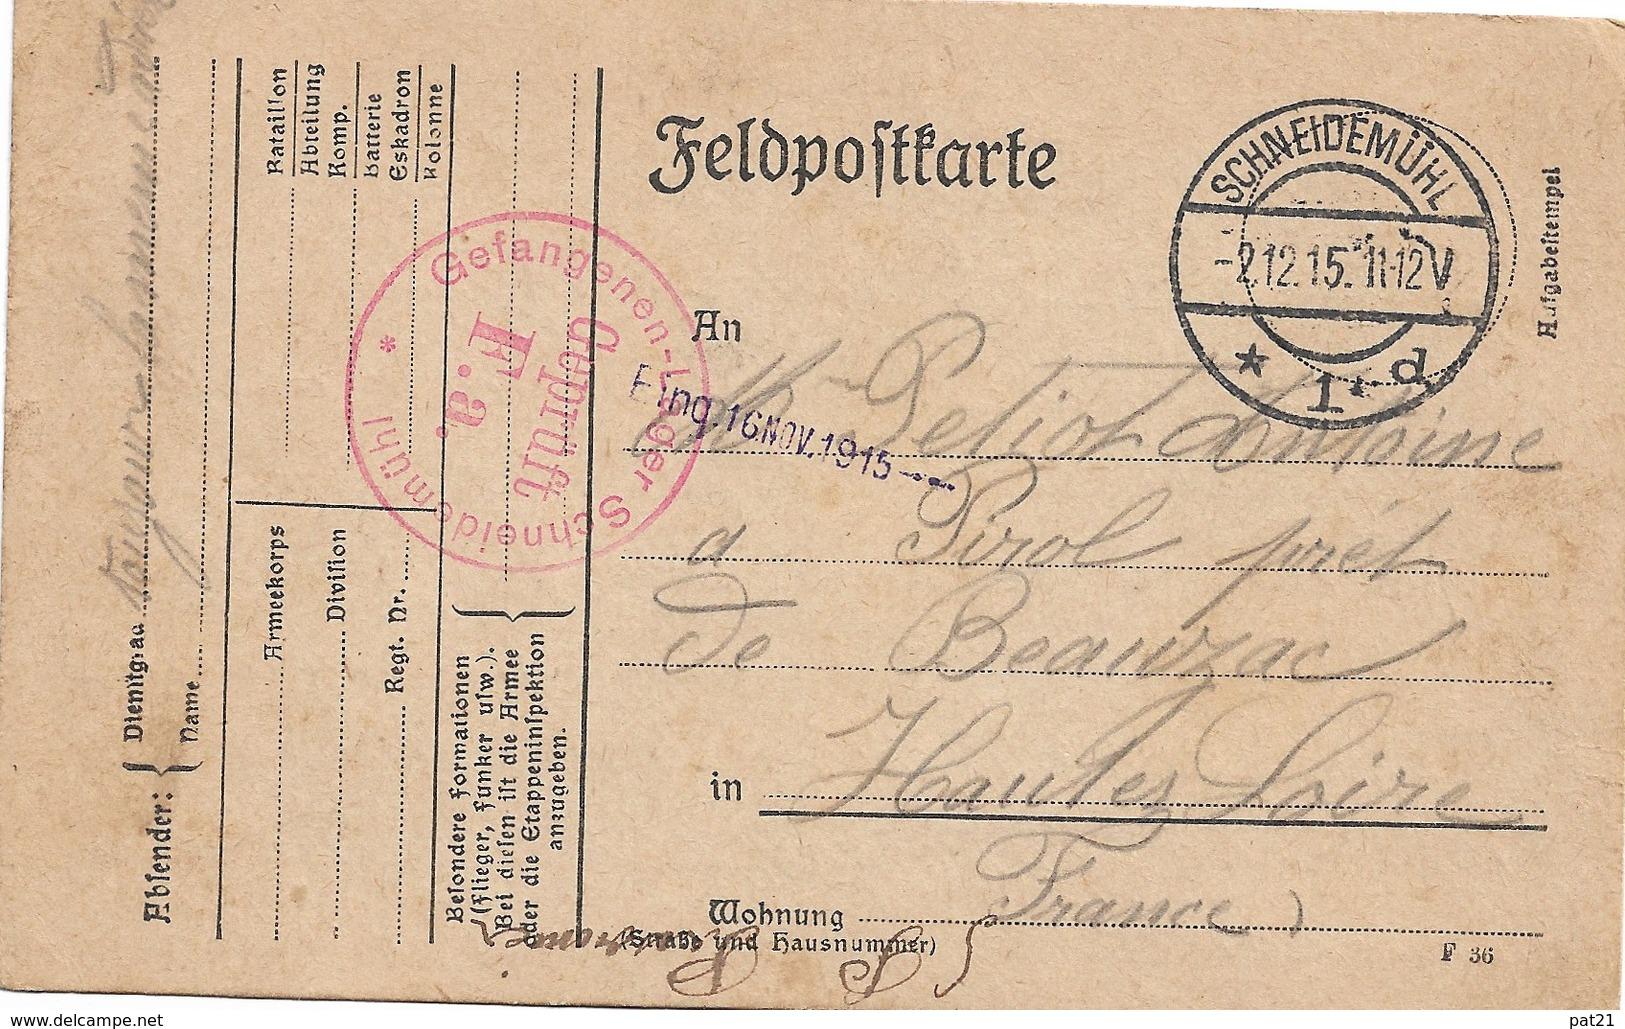 WW1 Schneidemuhl 2 12 1915 Gepruft F A Adressé à Pirol Près De Beauzac - Briefe U. Dokumente